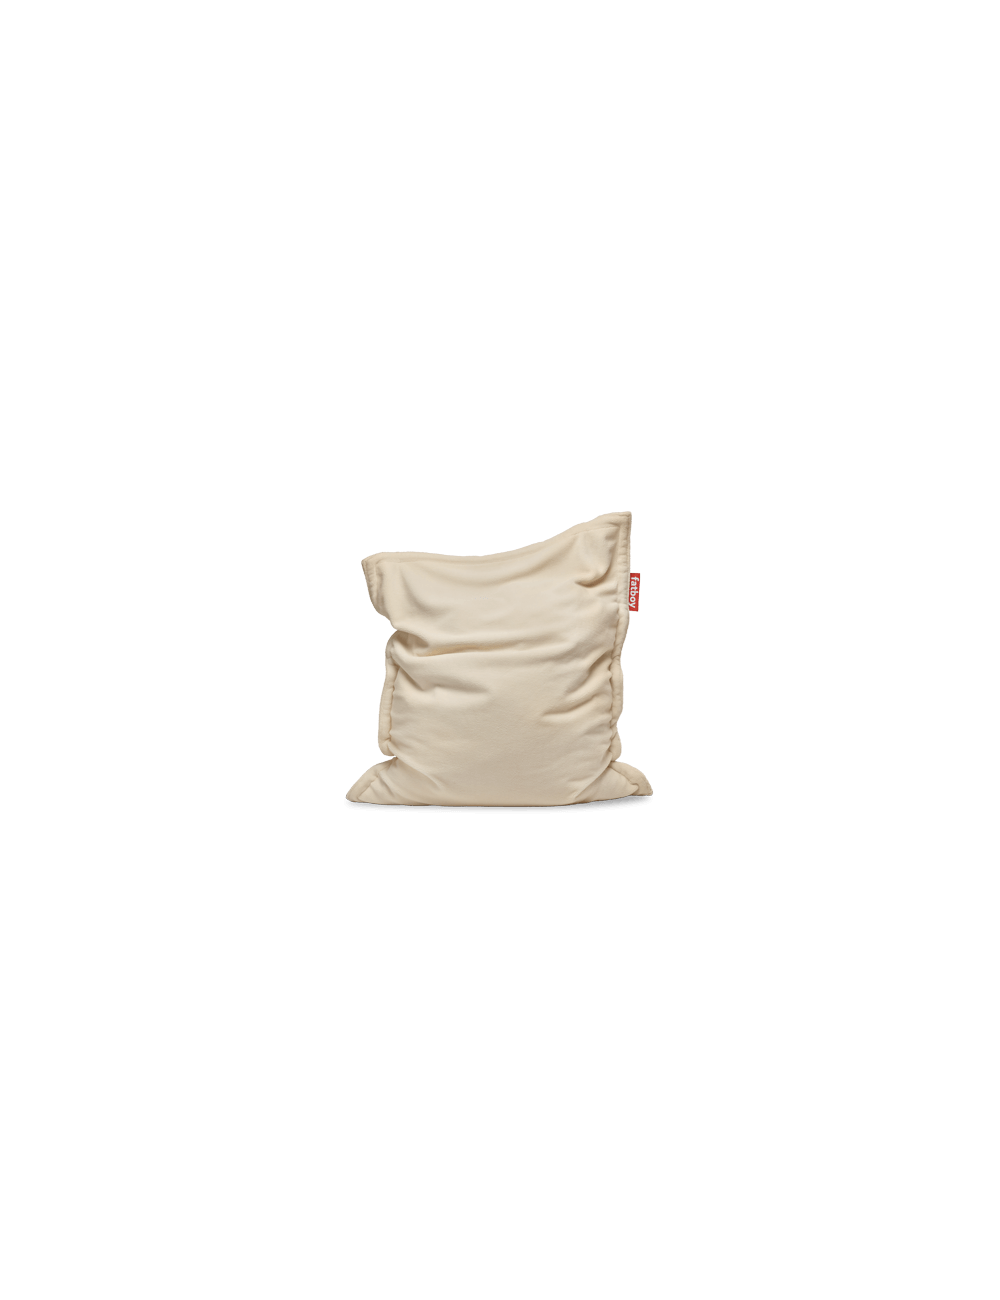 Zitzak Original Slim Teddy | off-white